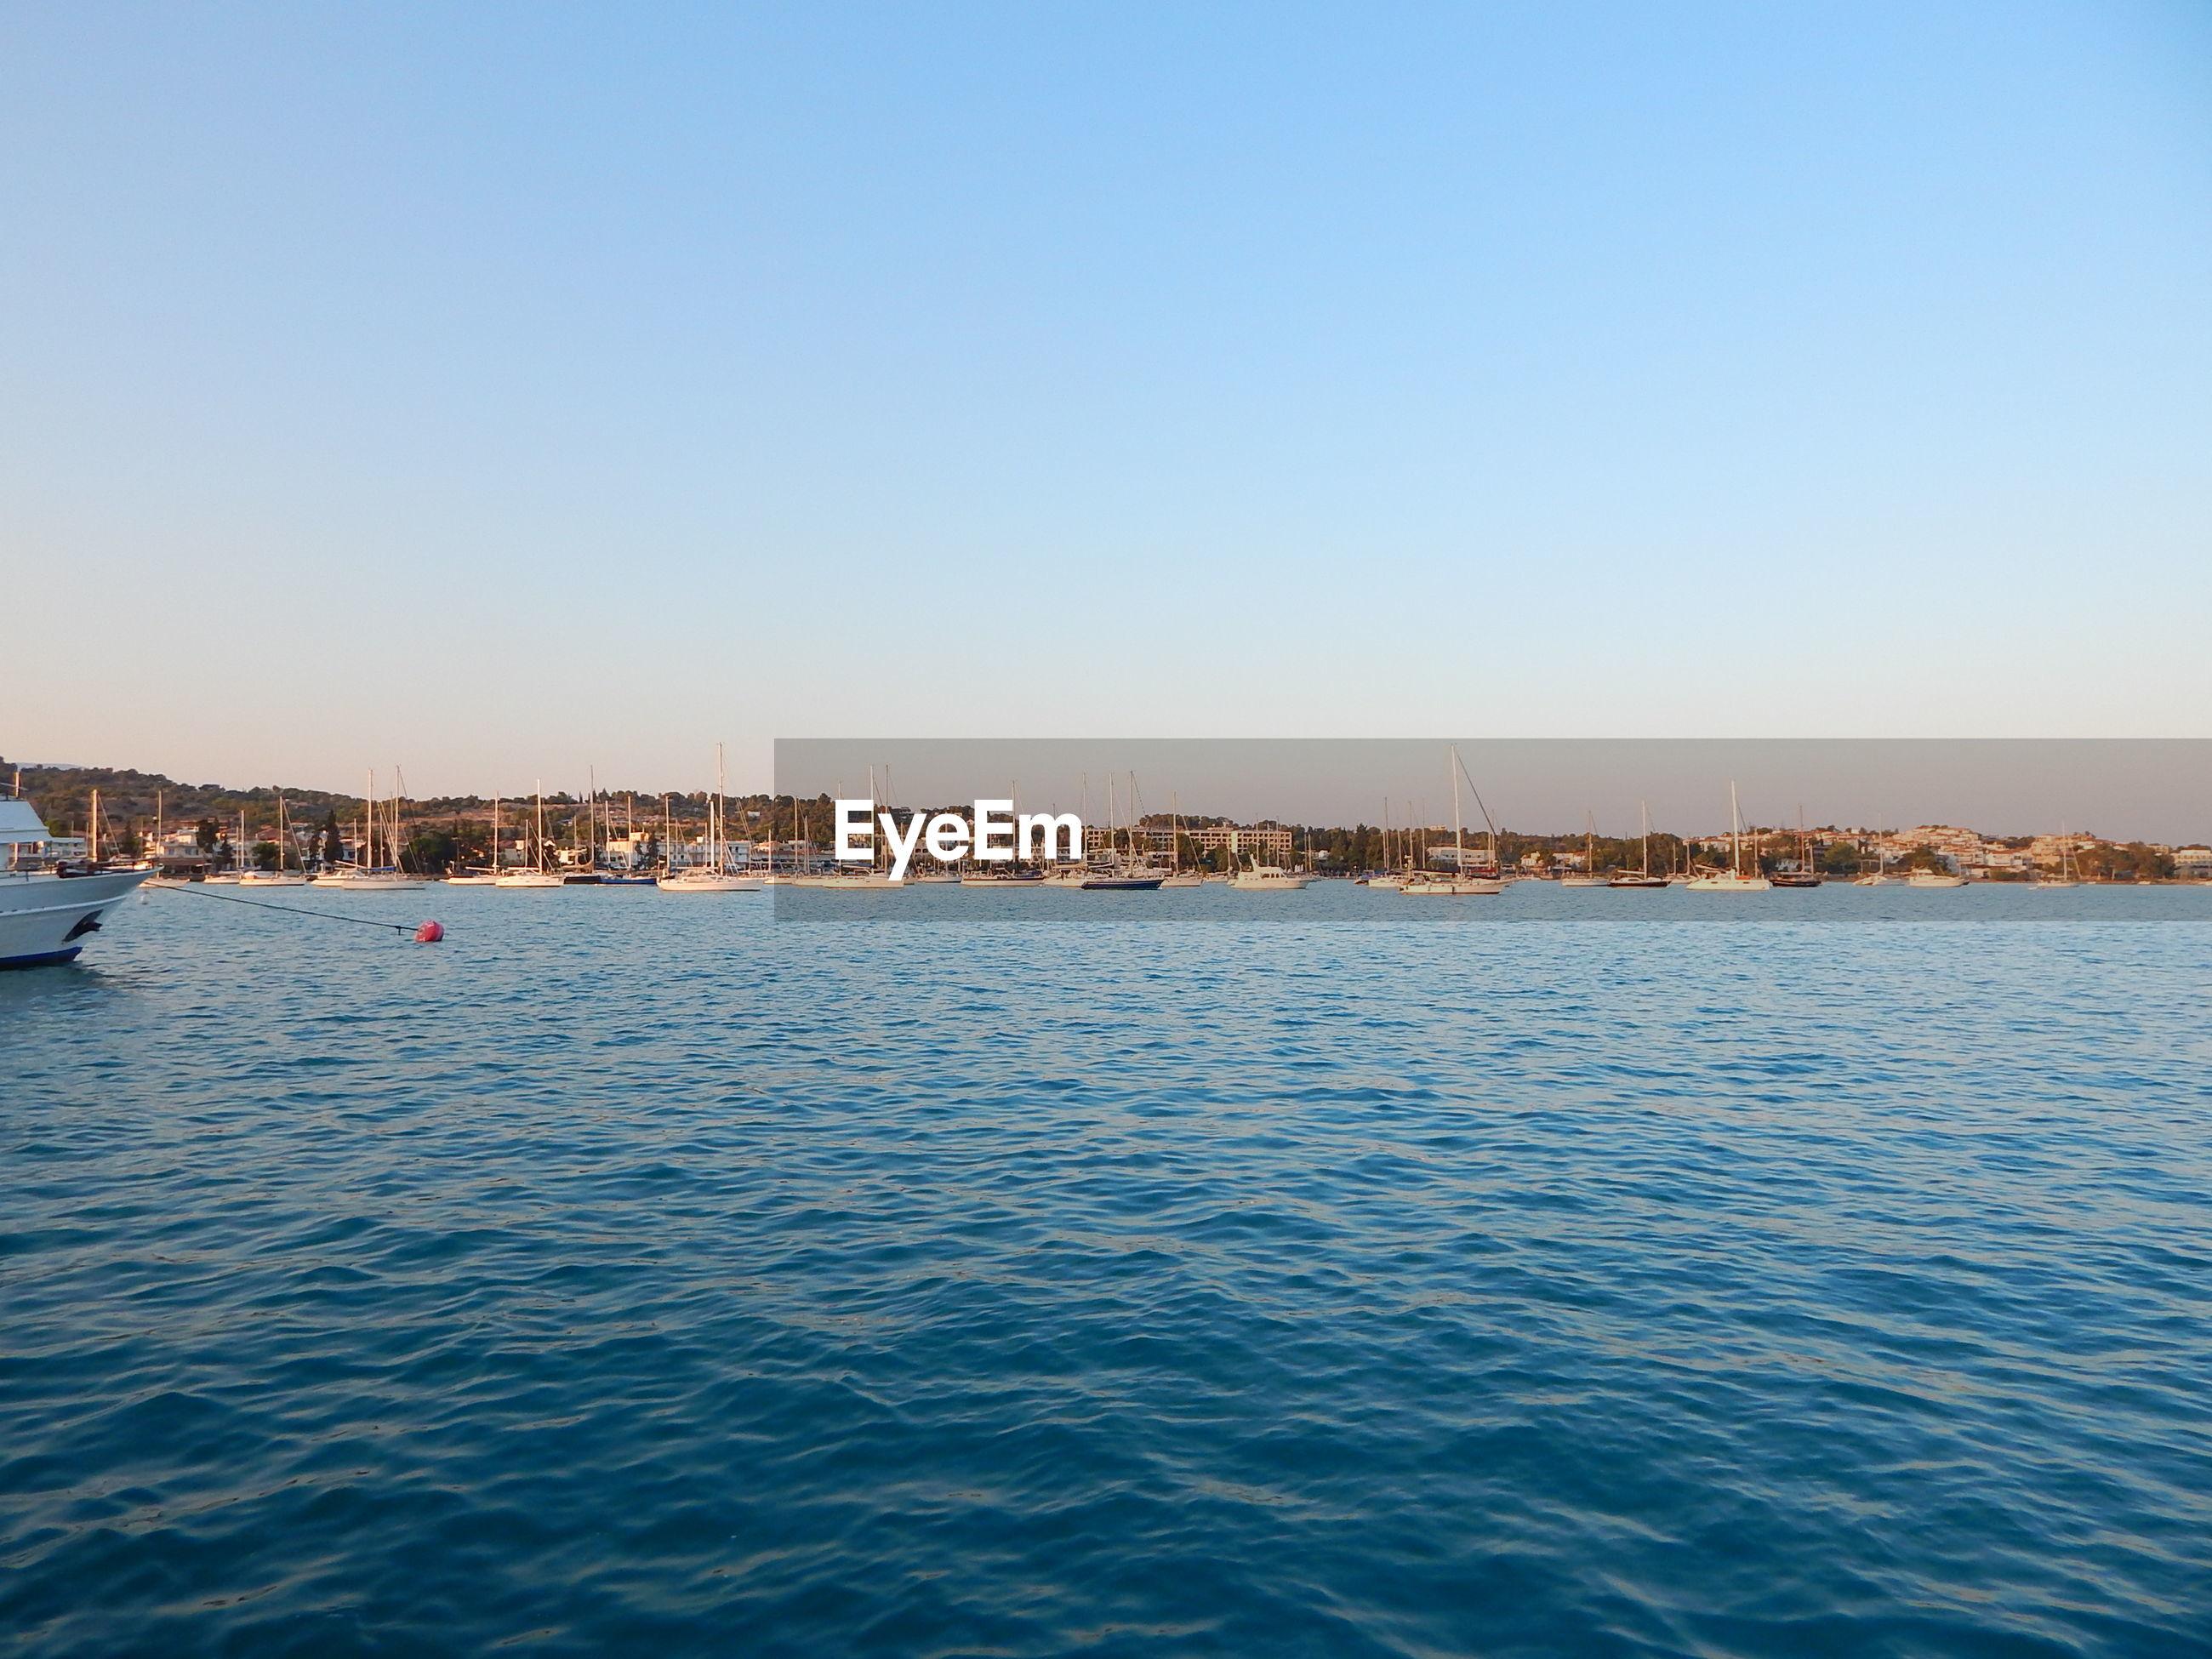 VIEW OF CALM BLUE SEA